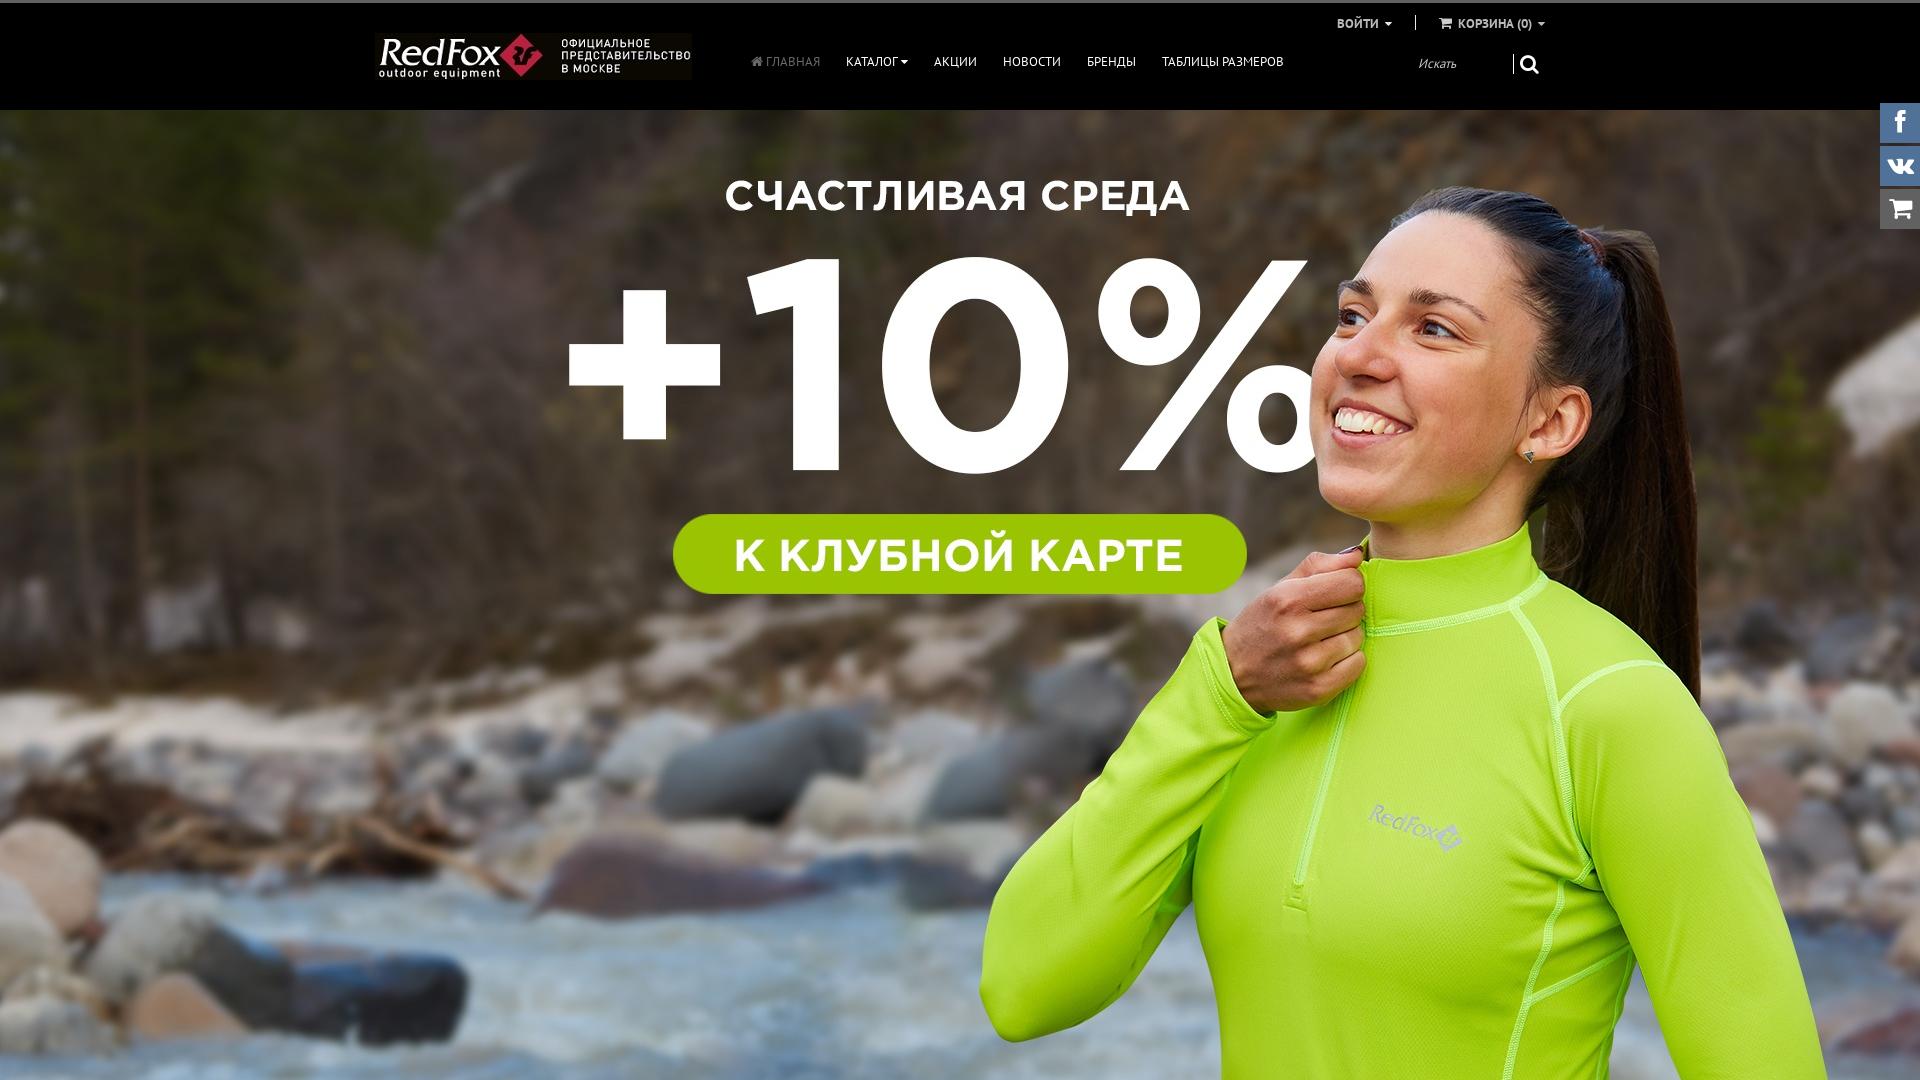 redfoxmsk website